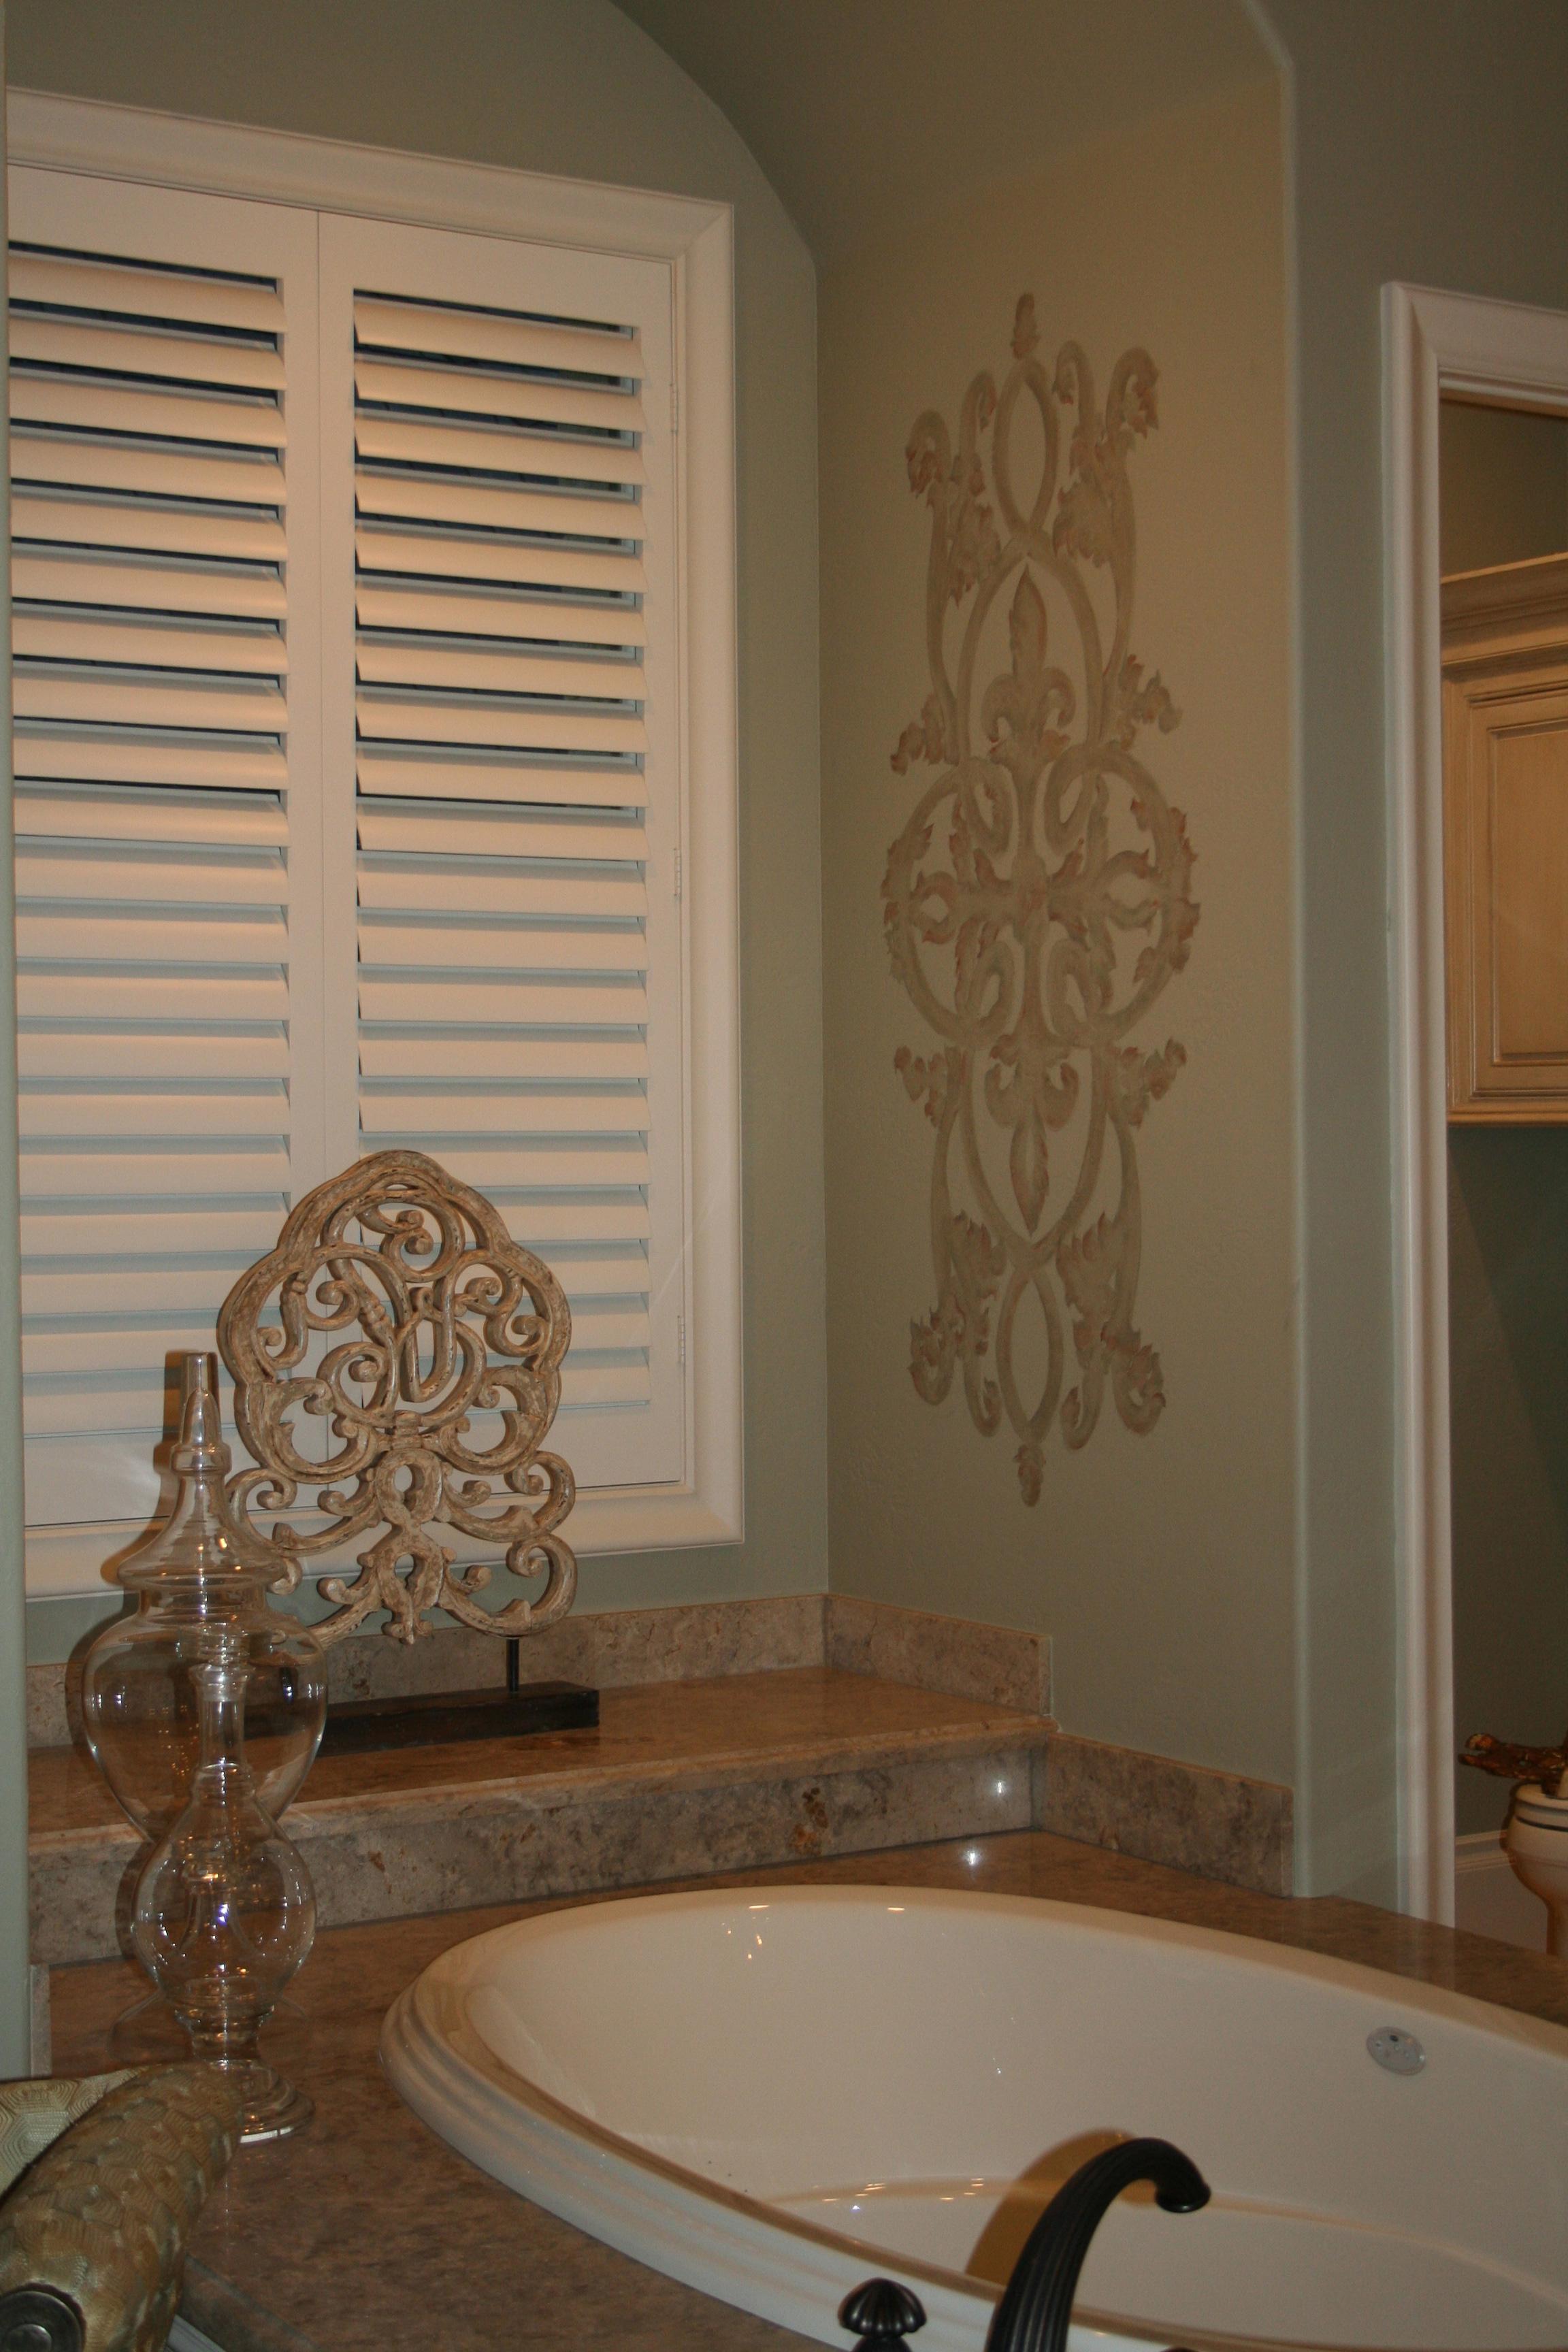 Custom designed pattern for bath